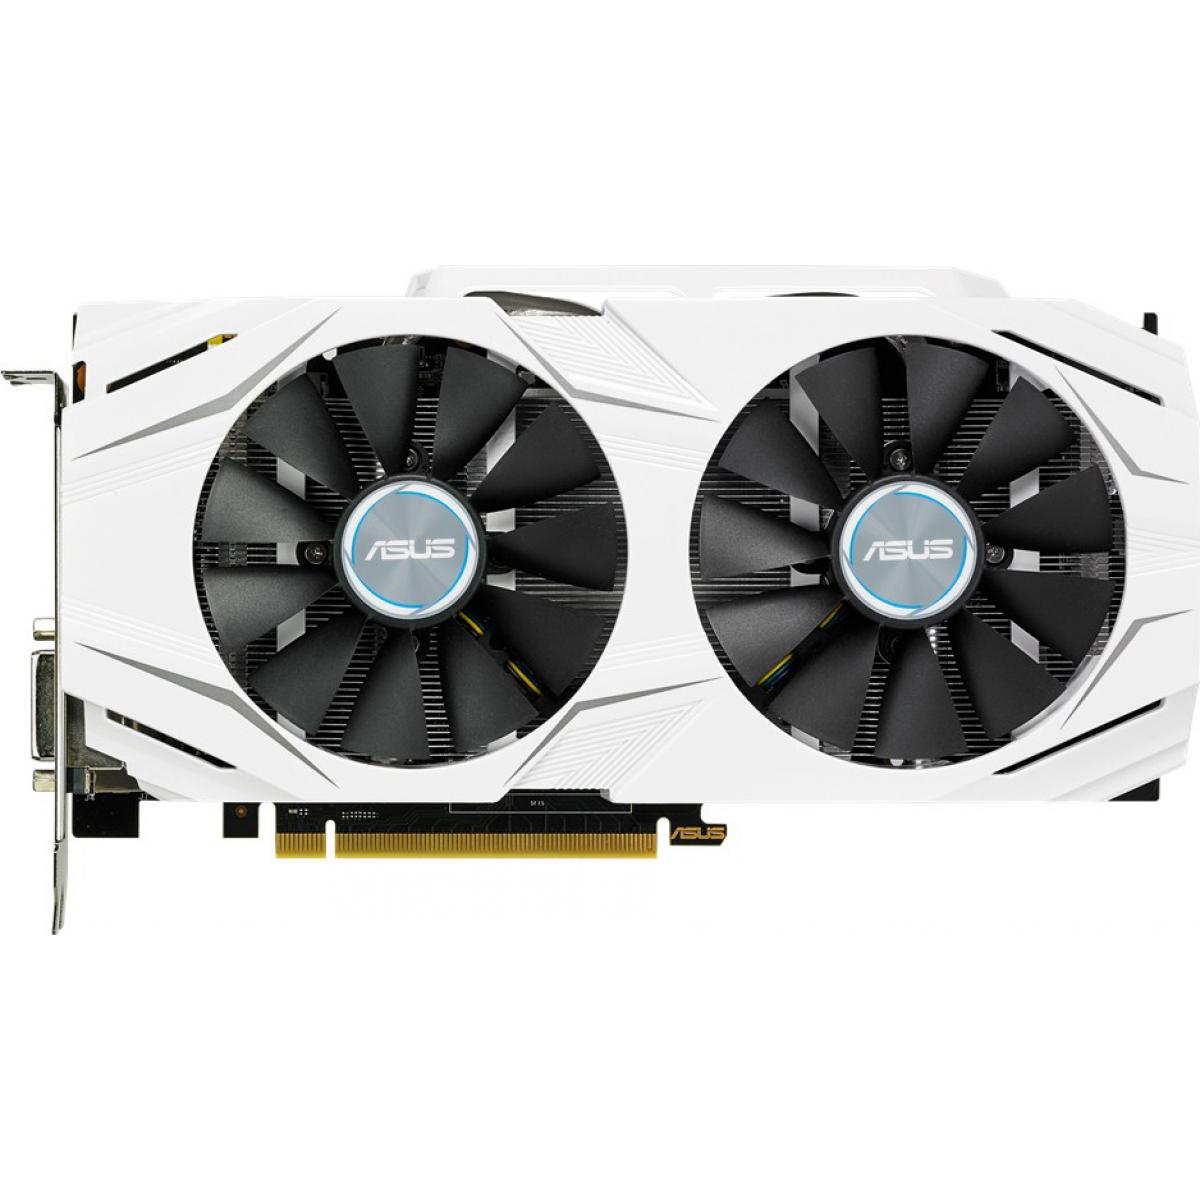 Placa de Vídeo Asus, Geforce, Gtx 1070, Dual, 8GB, DDR5, 256Bit, DUAL-GTX1070-O8G